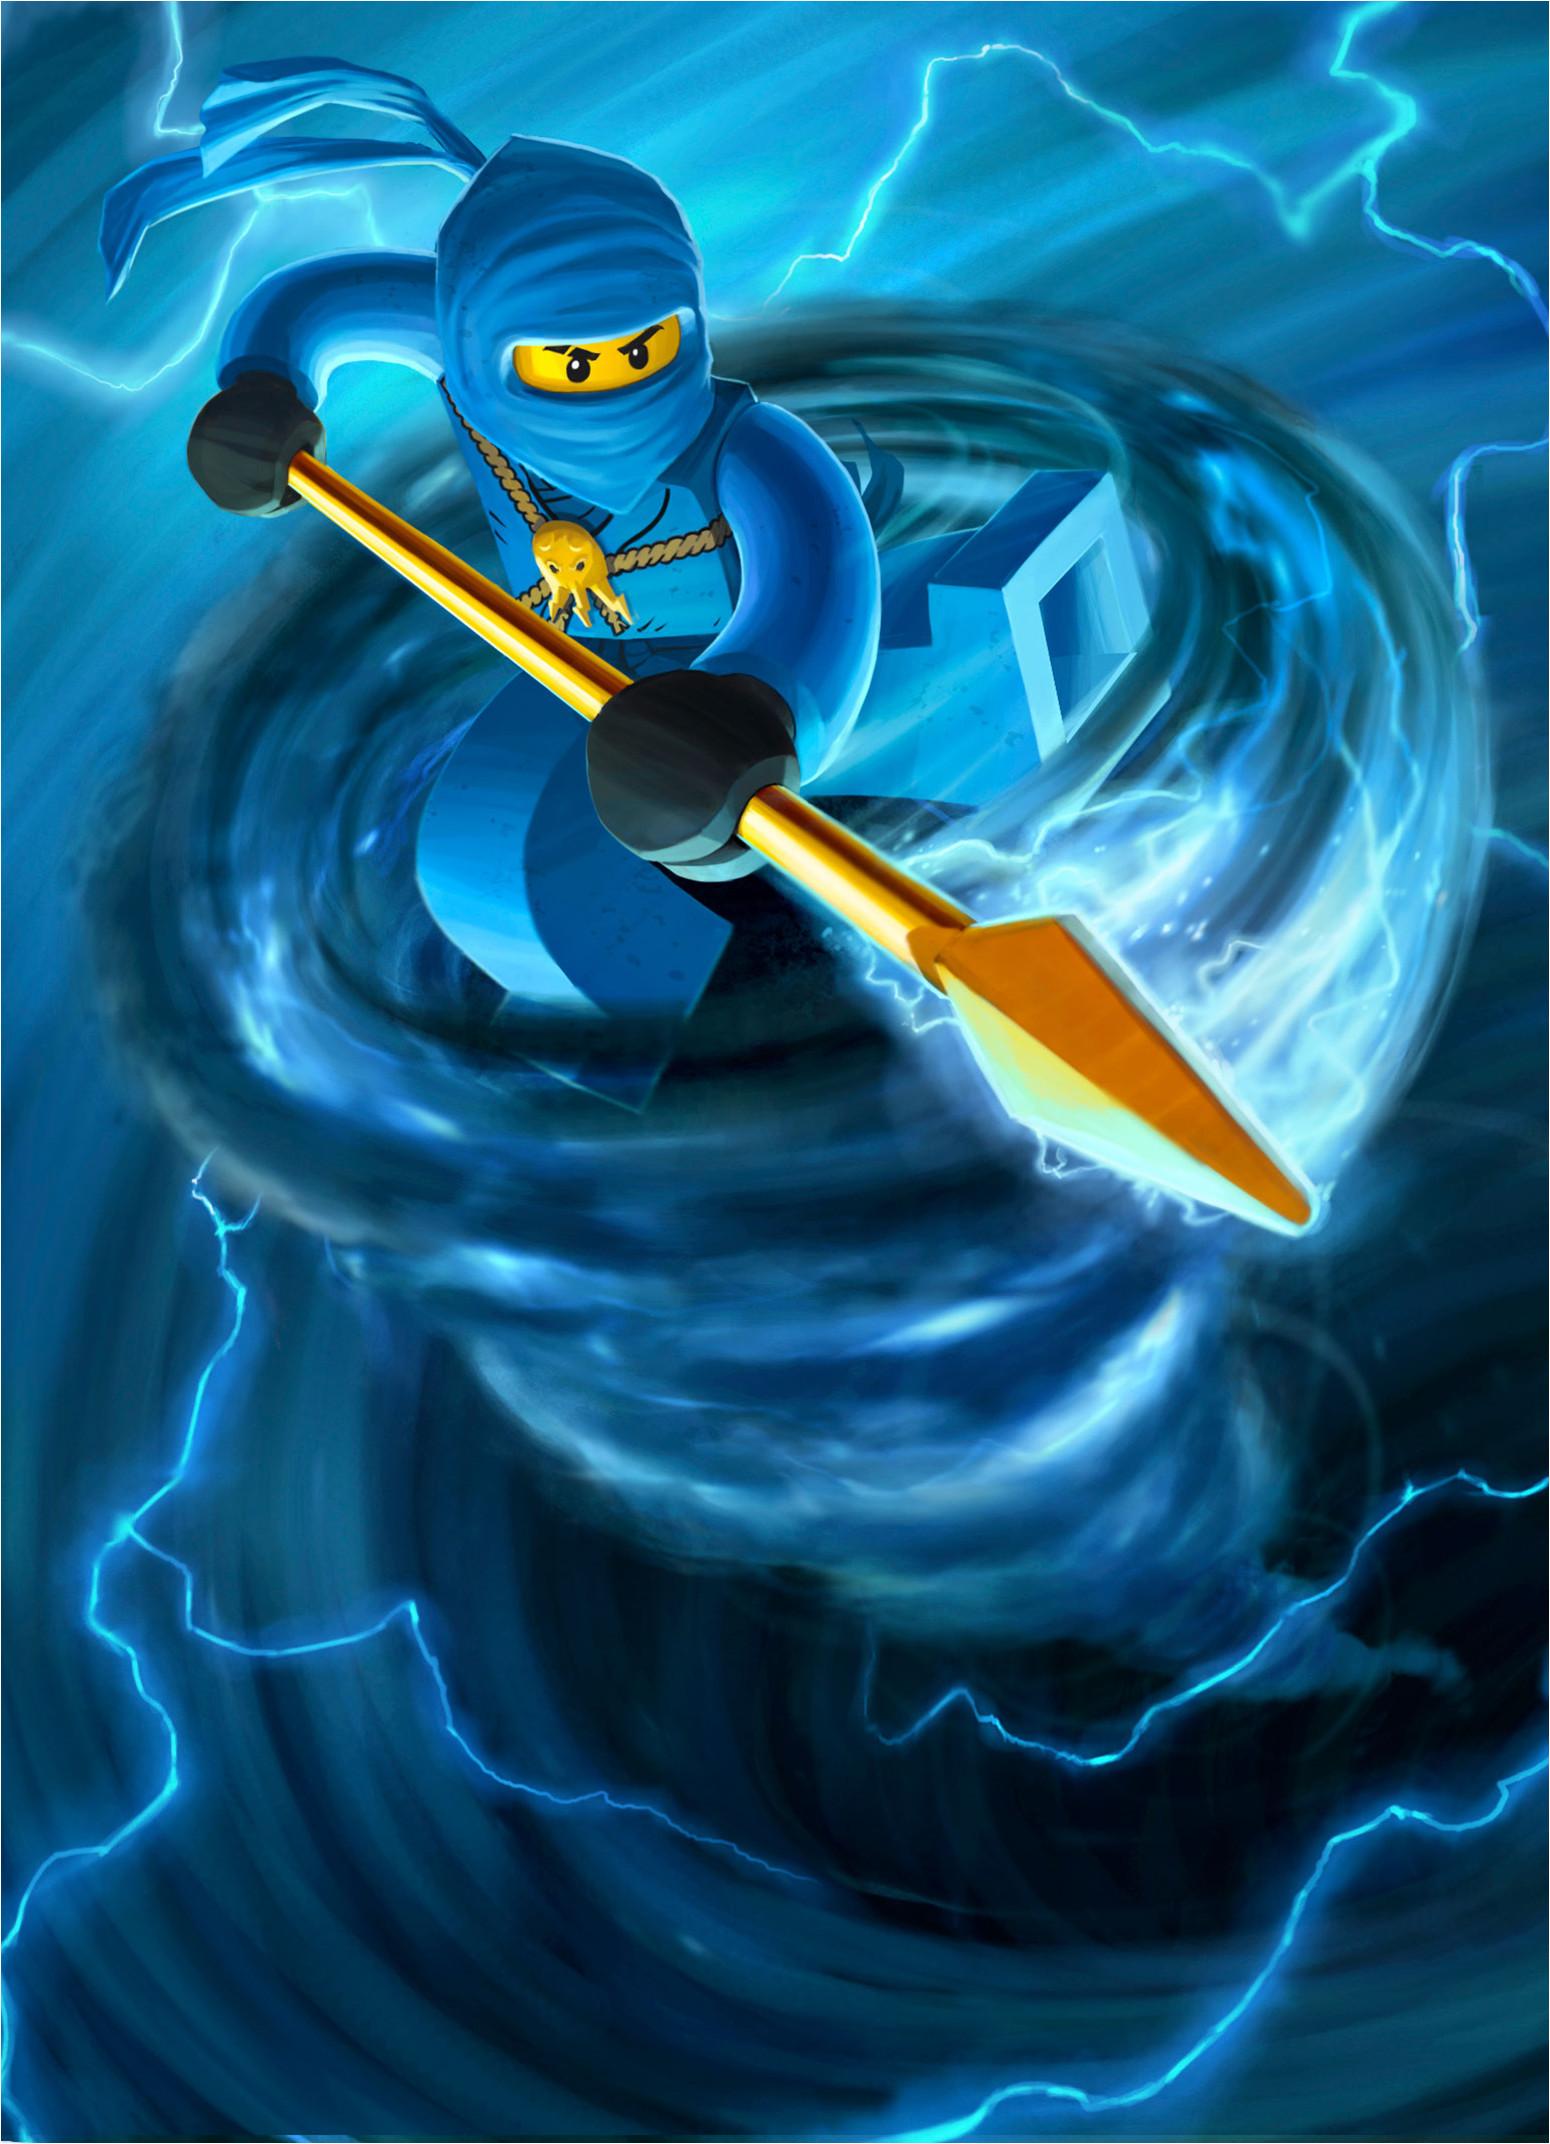 Explore Ninjago Party, Lego Ninjago, and more!